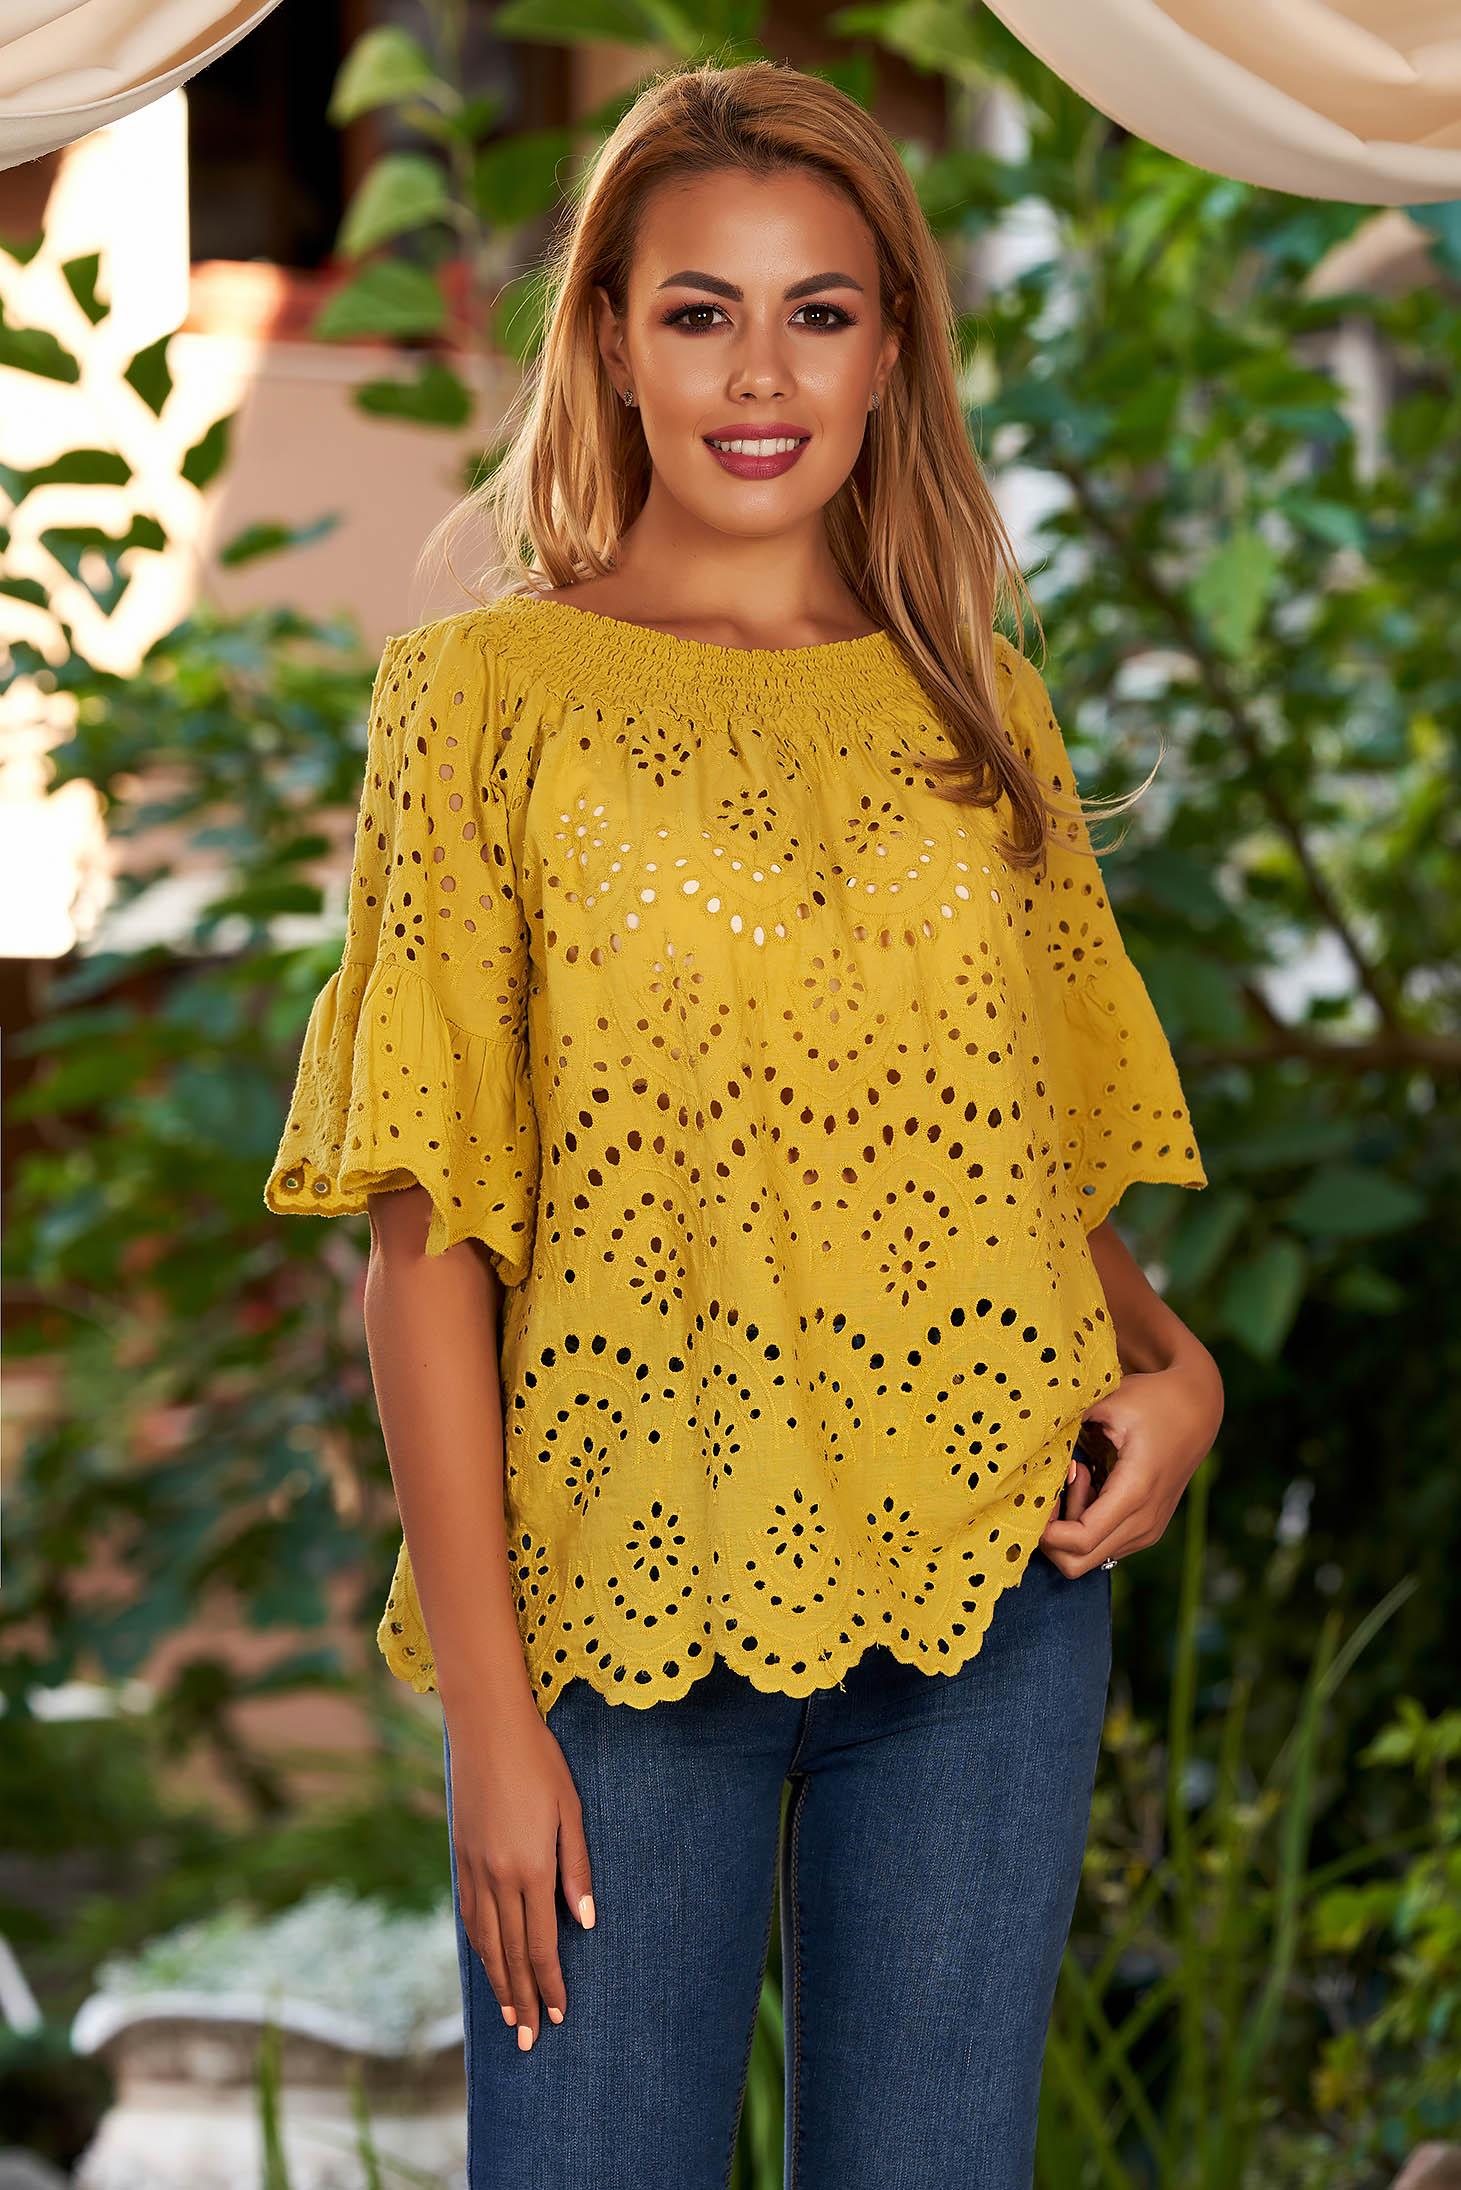 Bluza dama SunShine mustarie casual din bumbac cu croi larg umeri goi si maneci clopot